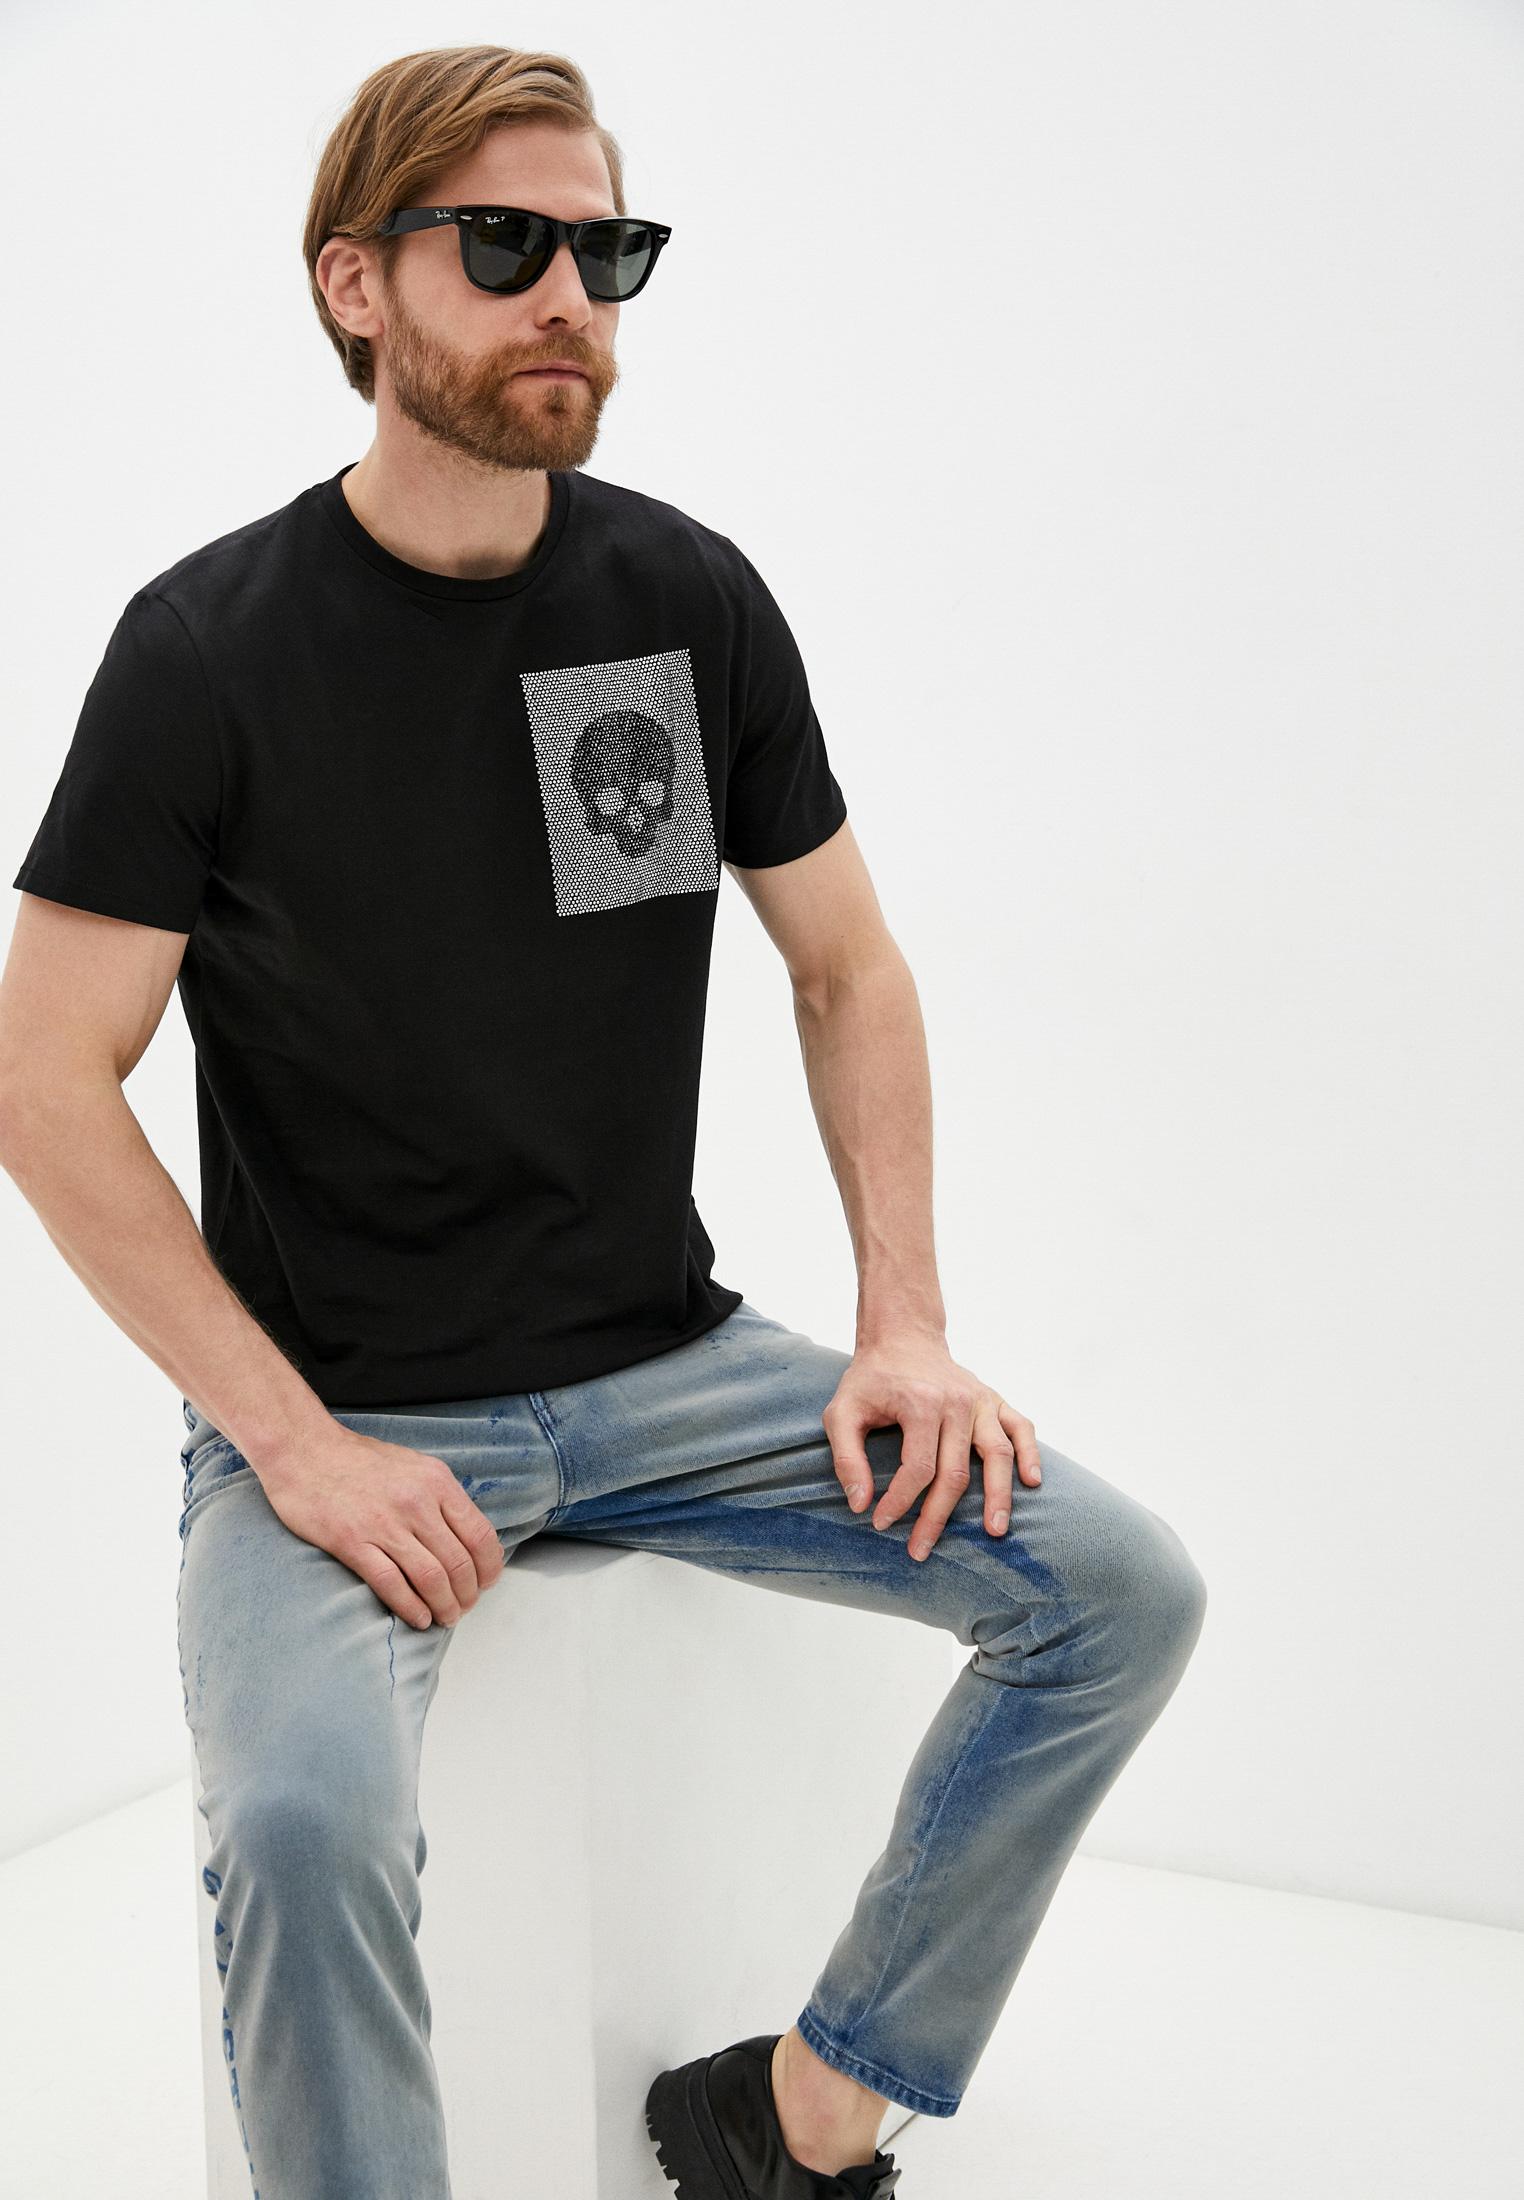 Мужская футболка Just Cavalli (Джаст Кавалли) S03GC0588 N20663